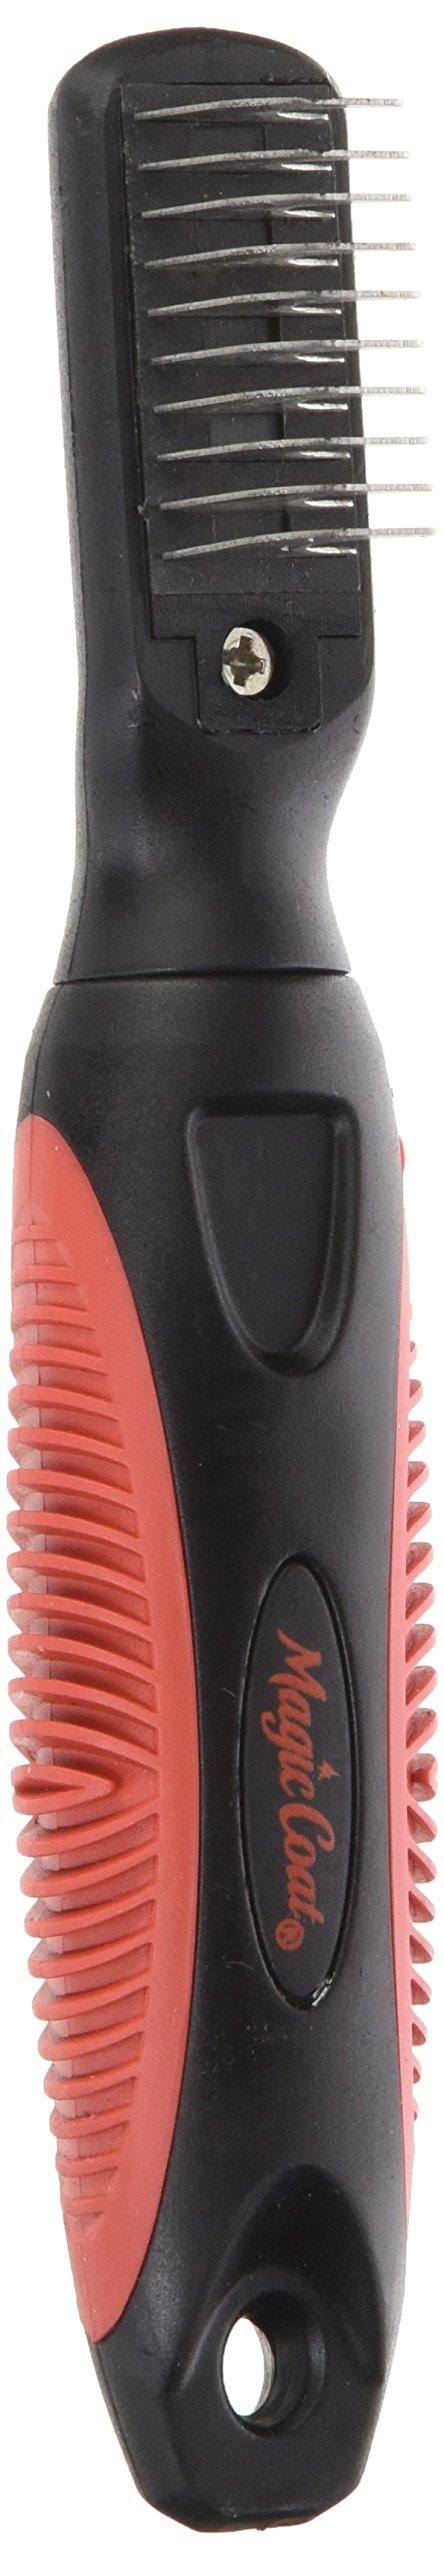 Four Paws Magic Coat De-Matting Tool - Sensitive Areas - Fine & Medium Hair